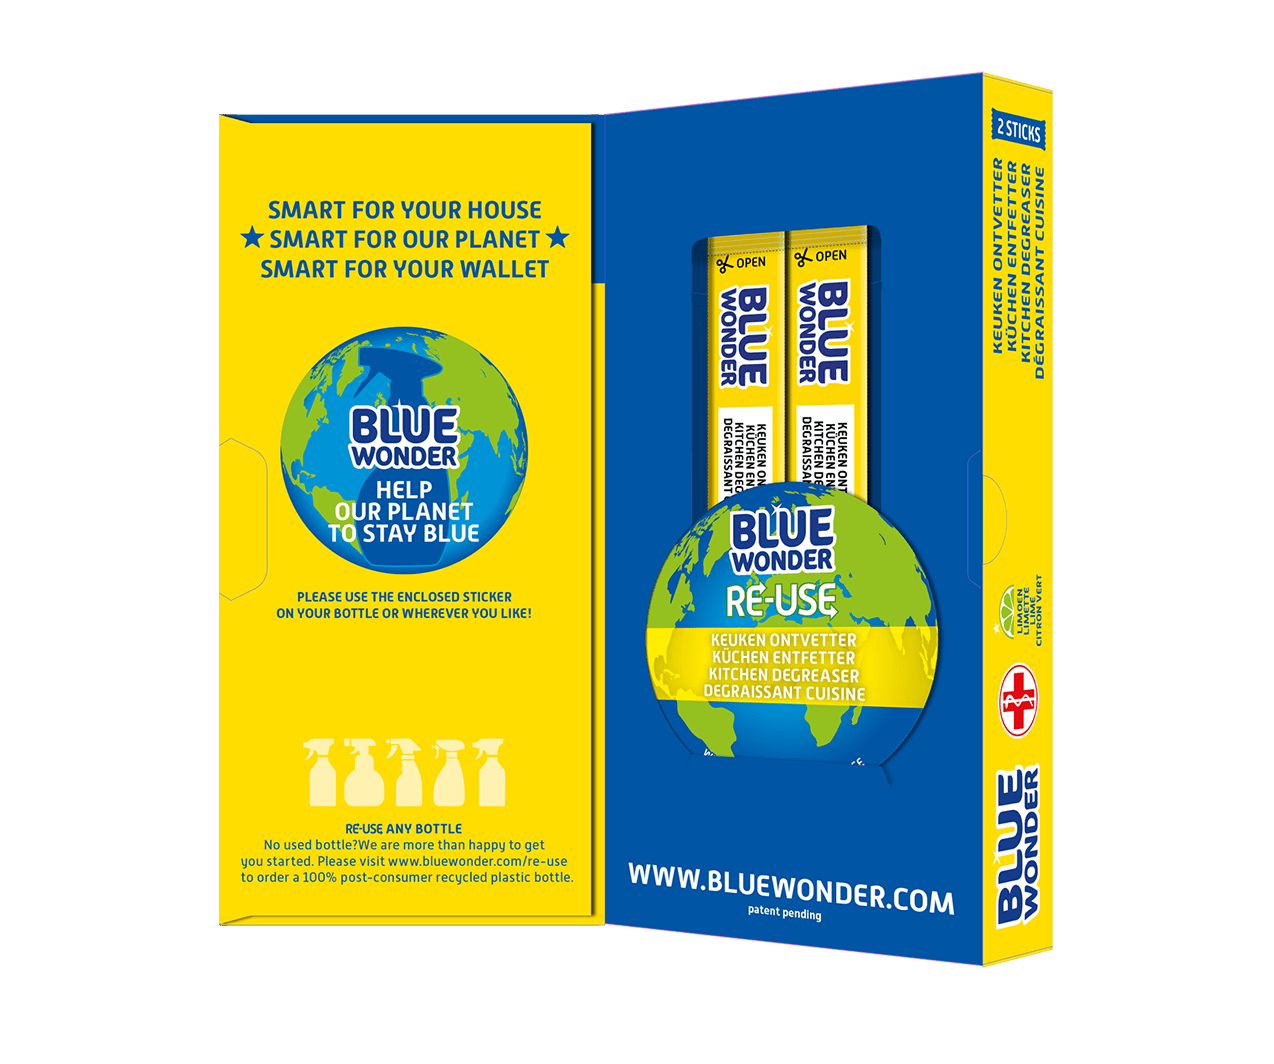 blue wonder re use box open1 keuken kuchen kitchen cuisine